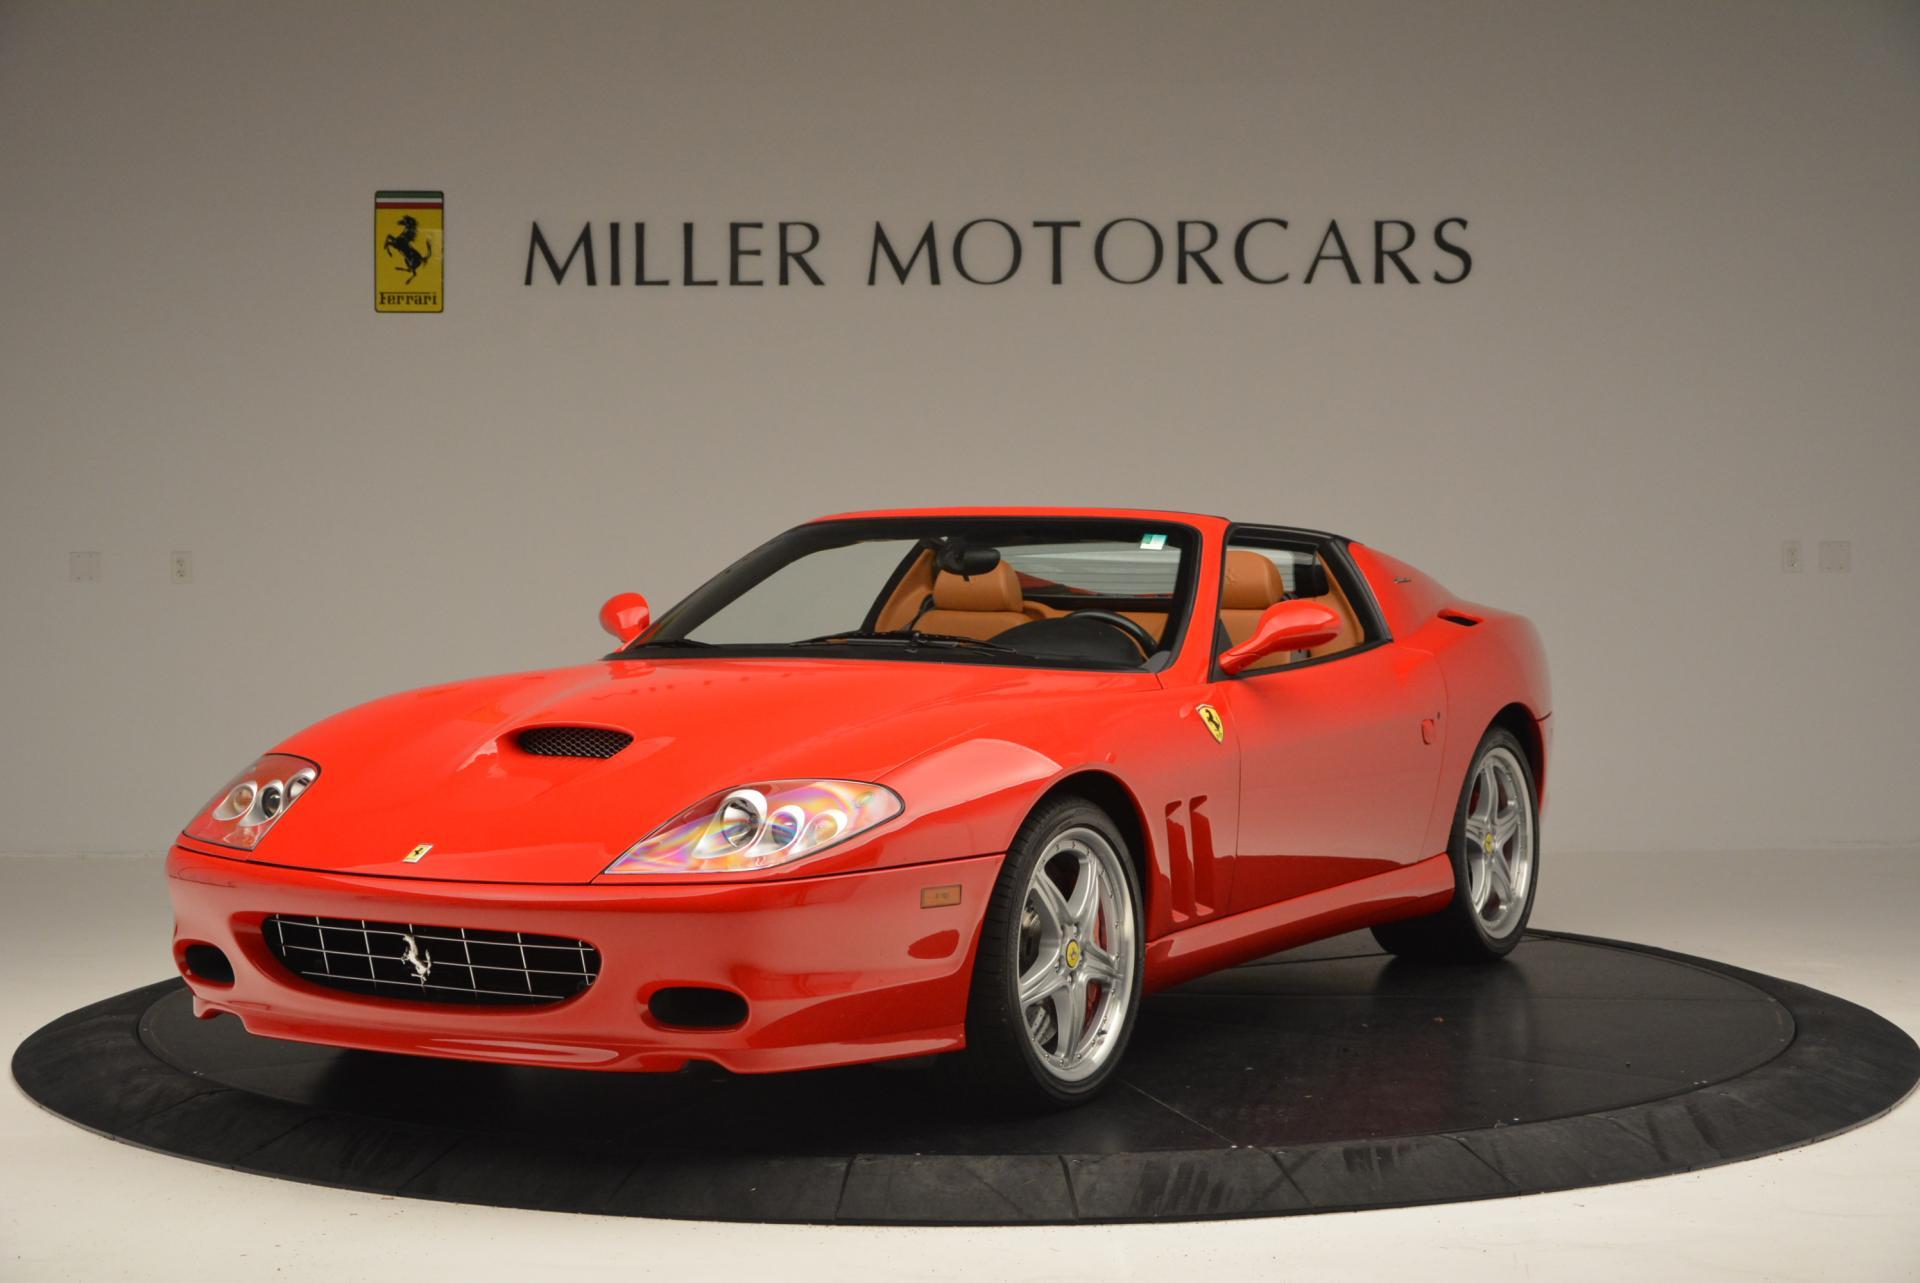 Used 2005 Ferrari Superamerica for sale Sold at Aston Martin of Greenwich in Greenwich CT 06830 1